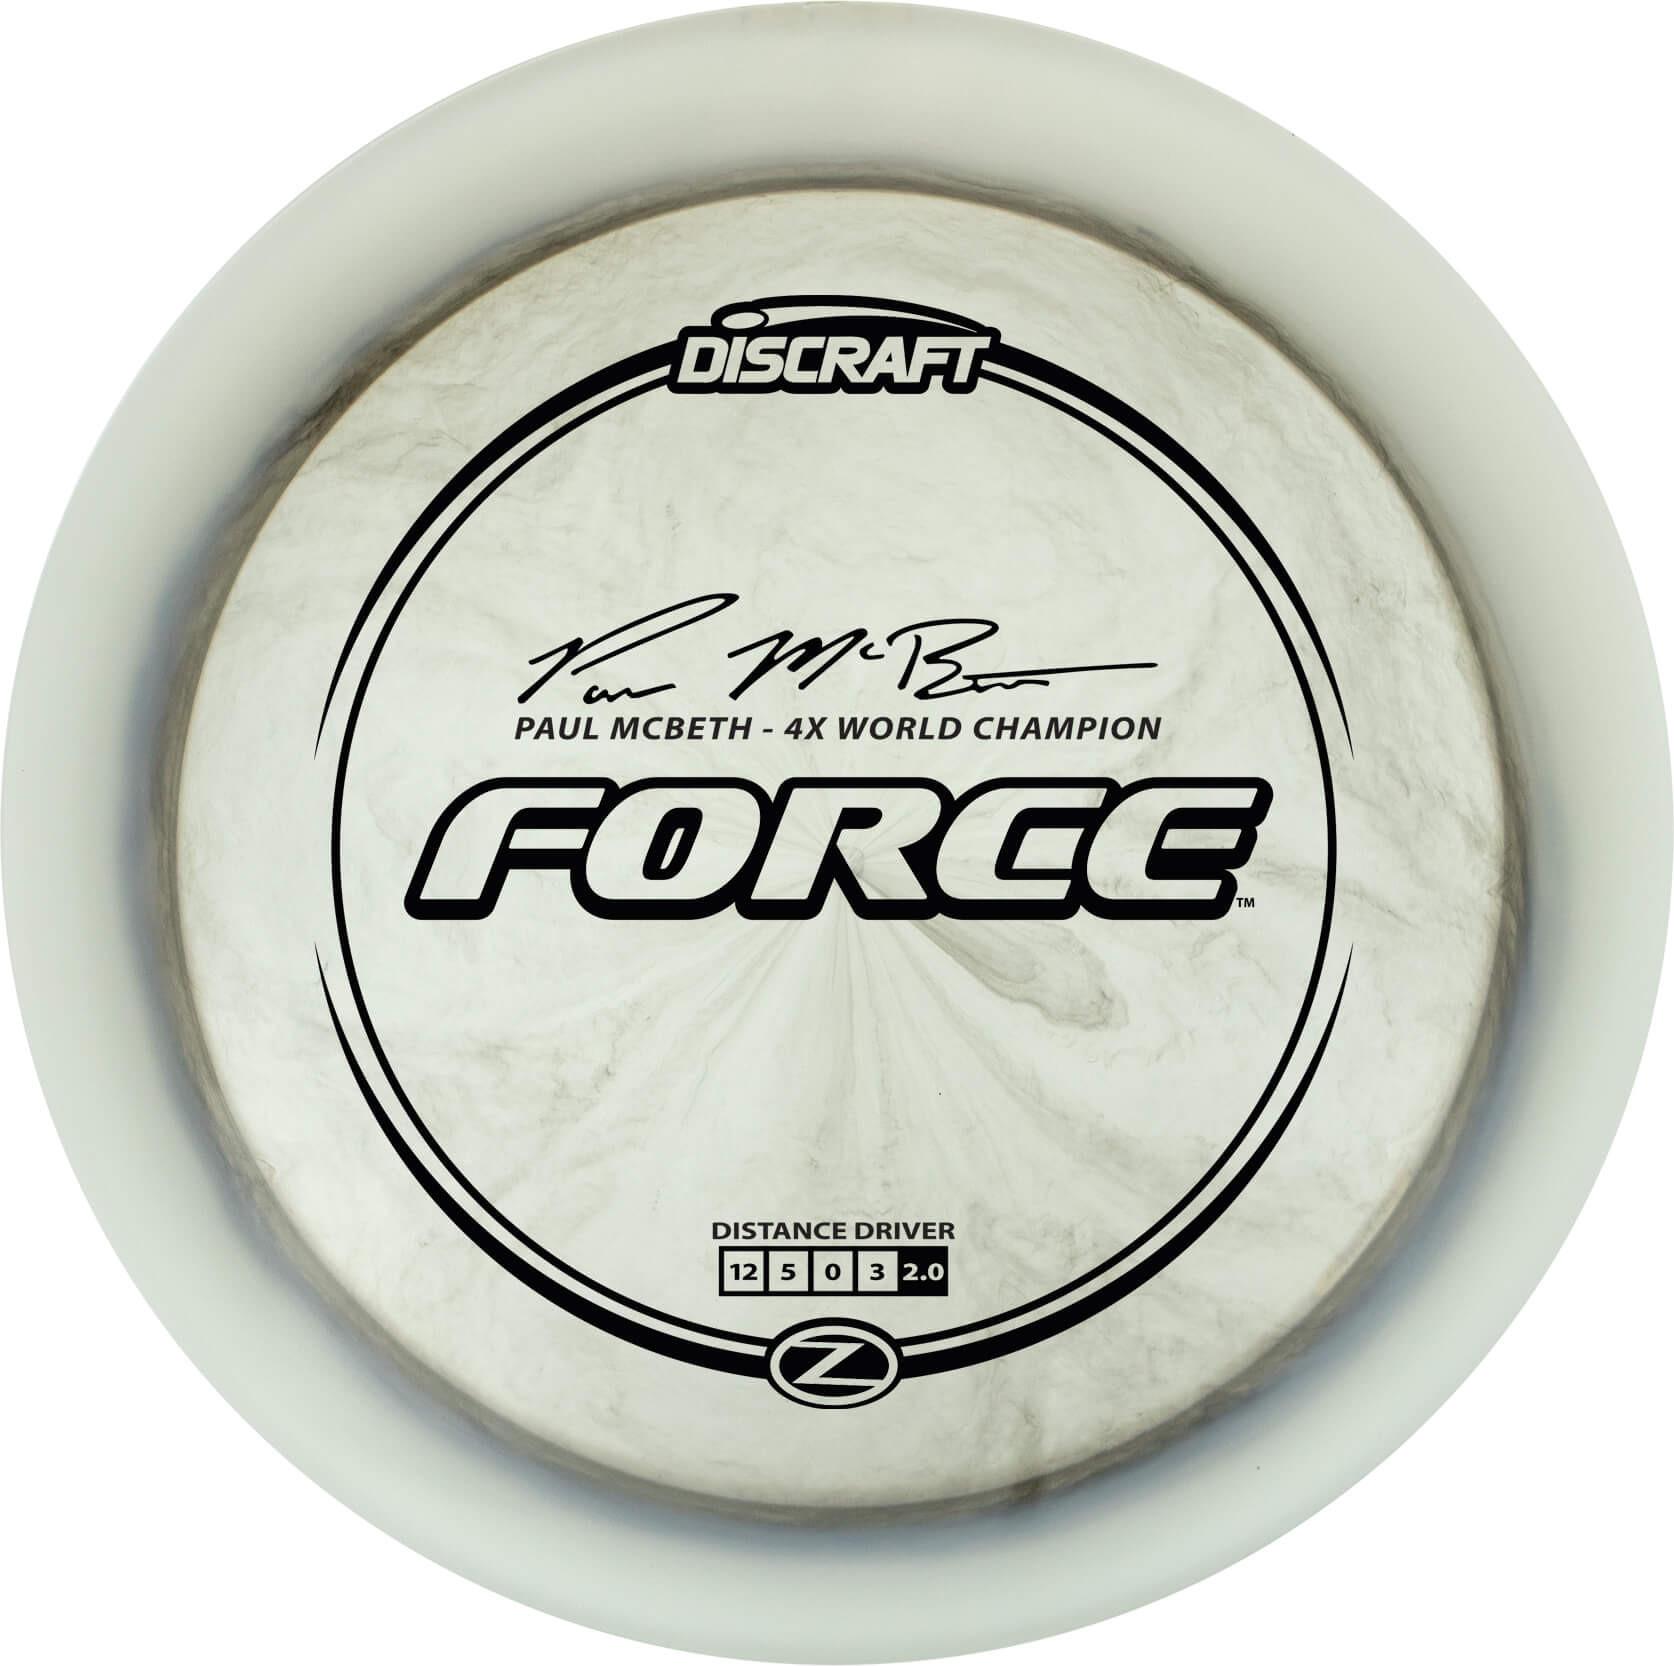 Discraft Paul McBeth Elite Z Force